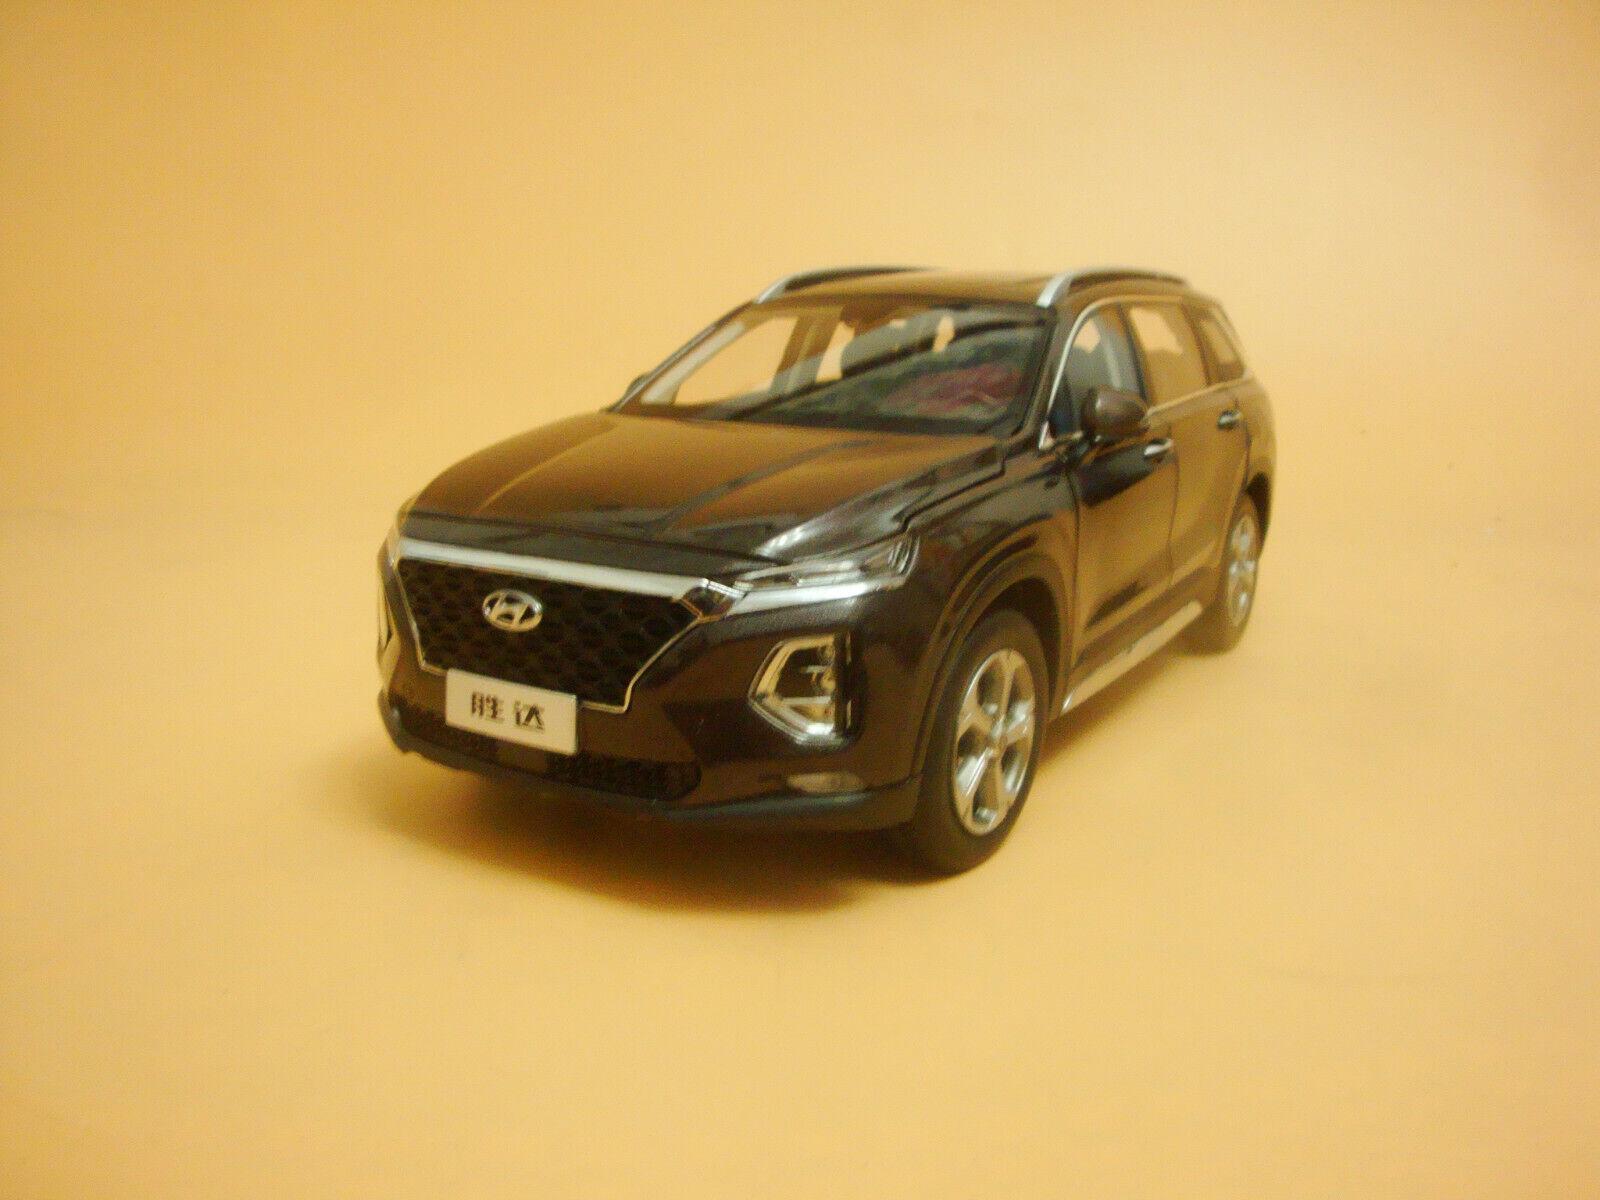 1 18 2019 All New Hyundai Santafe diecast Modelll